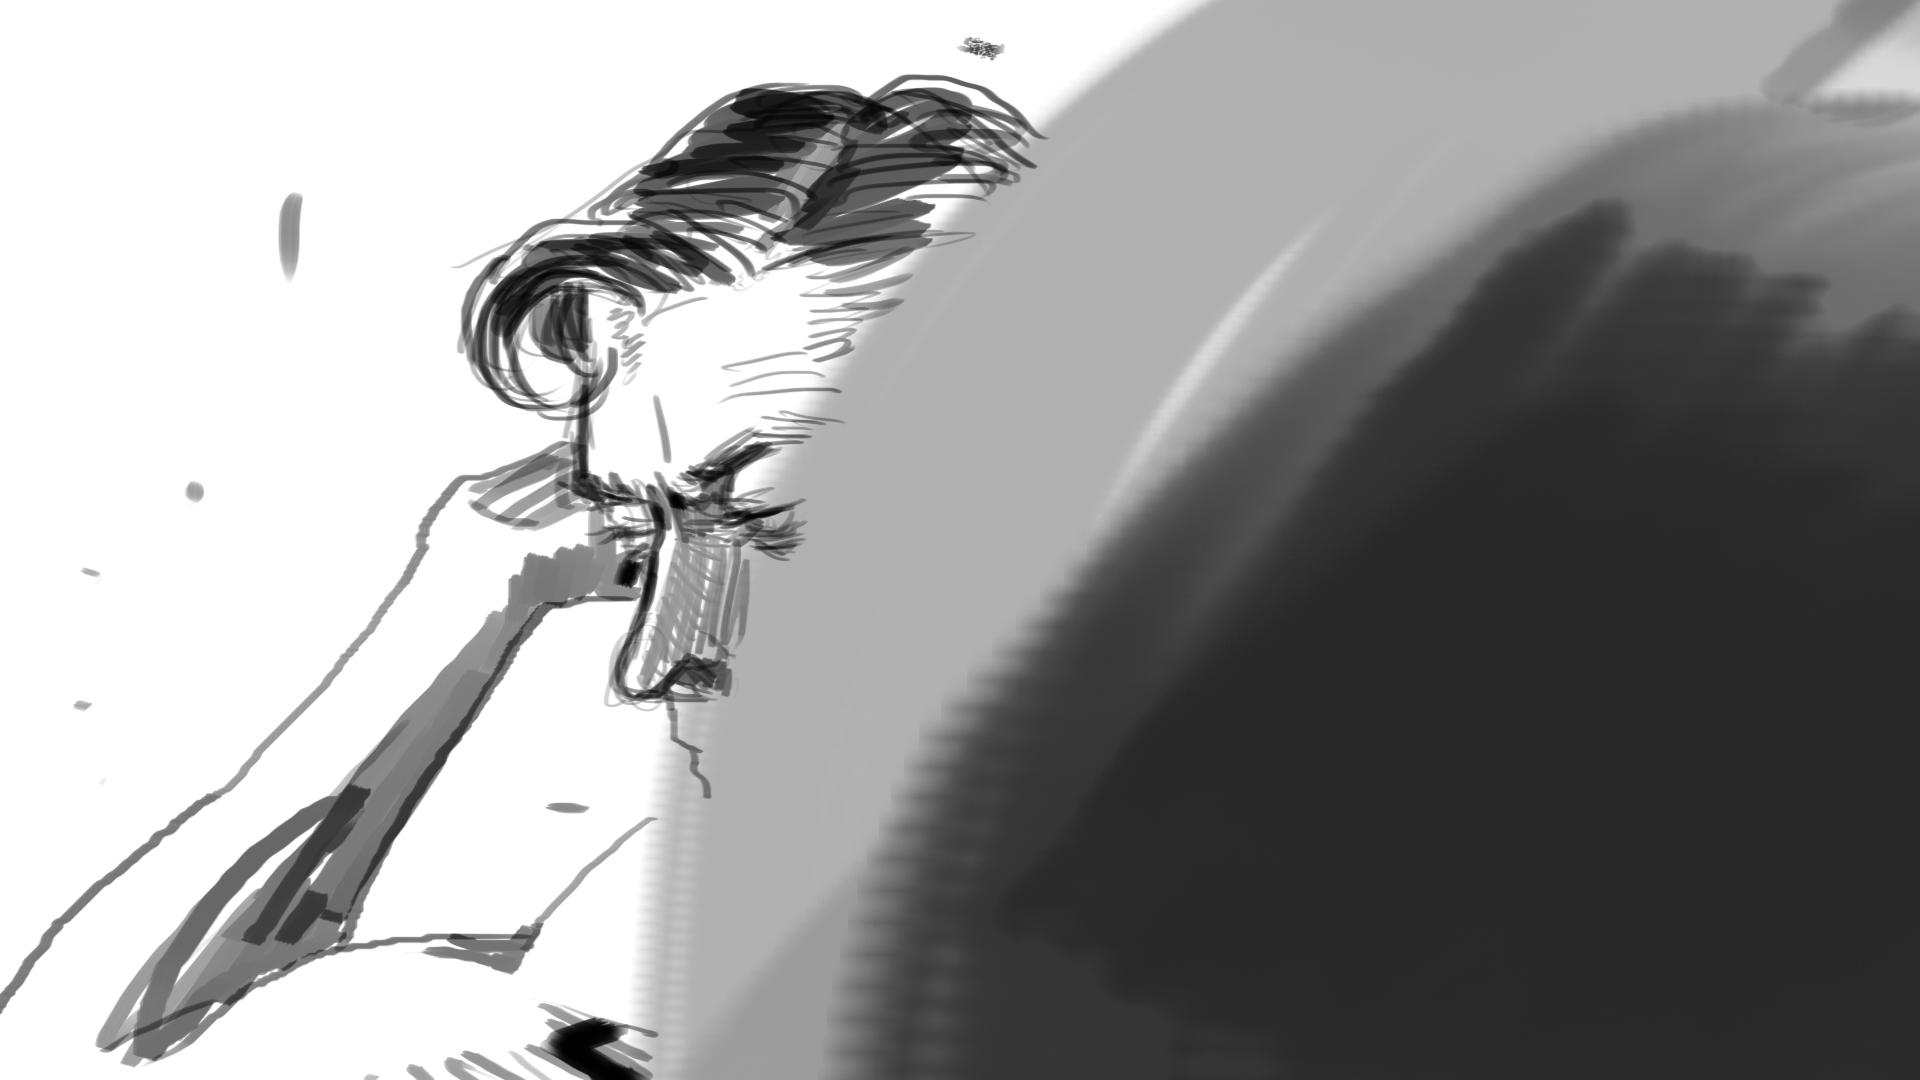 The Kid_Illustration16